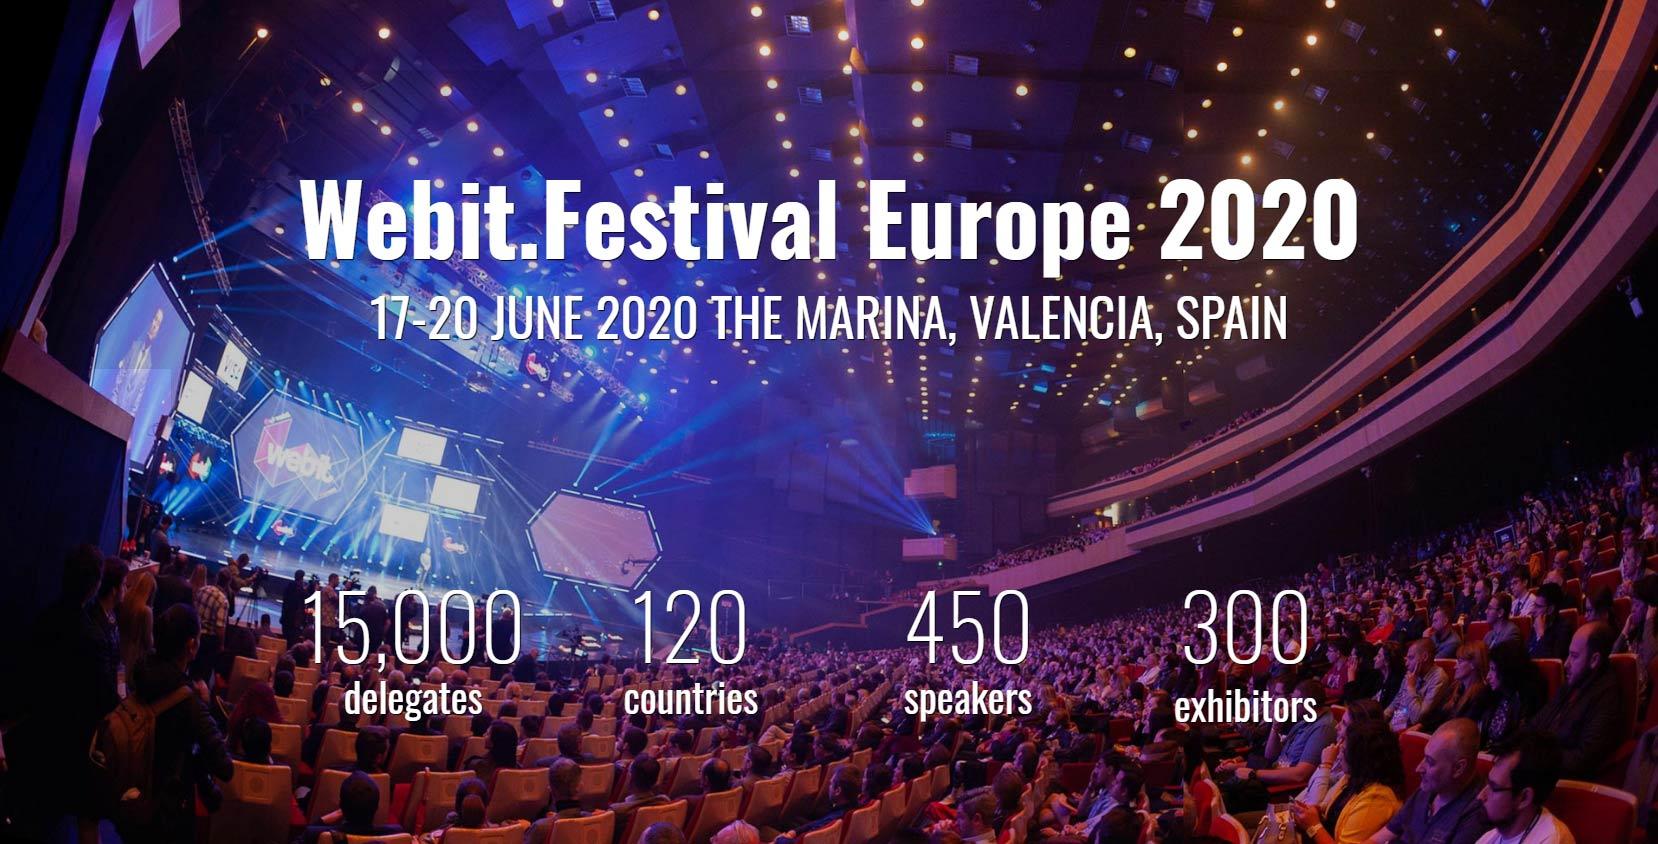 Behavioral_Signals_Webit_Festival_Europe_2020